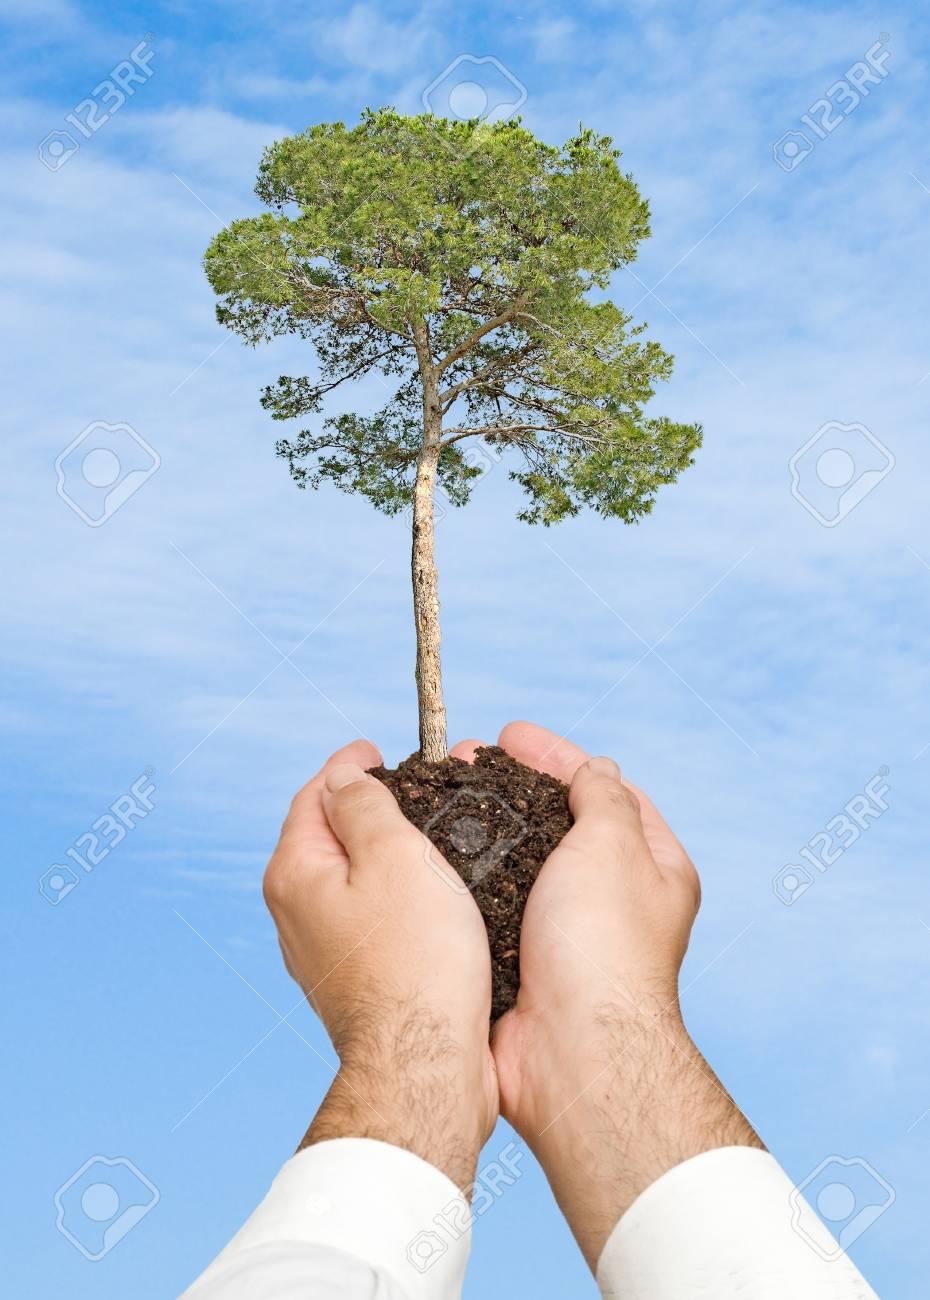 Pine tree in hands Stock Photo - 9539437